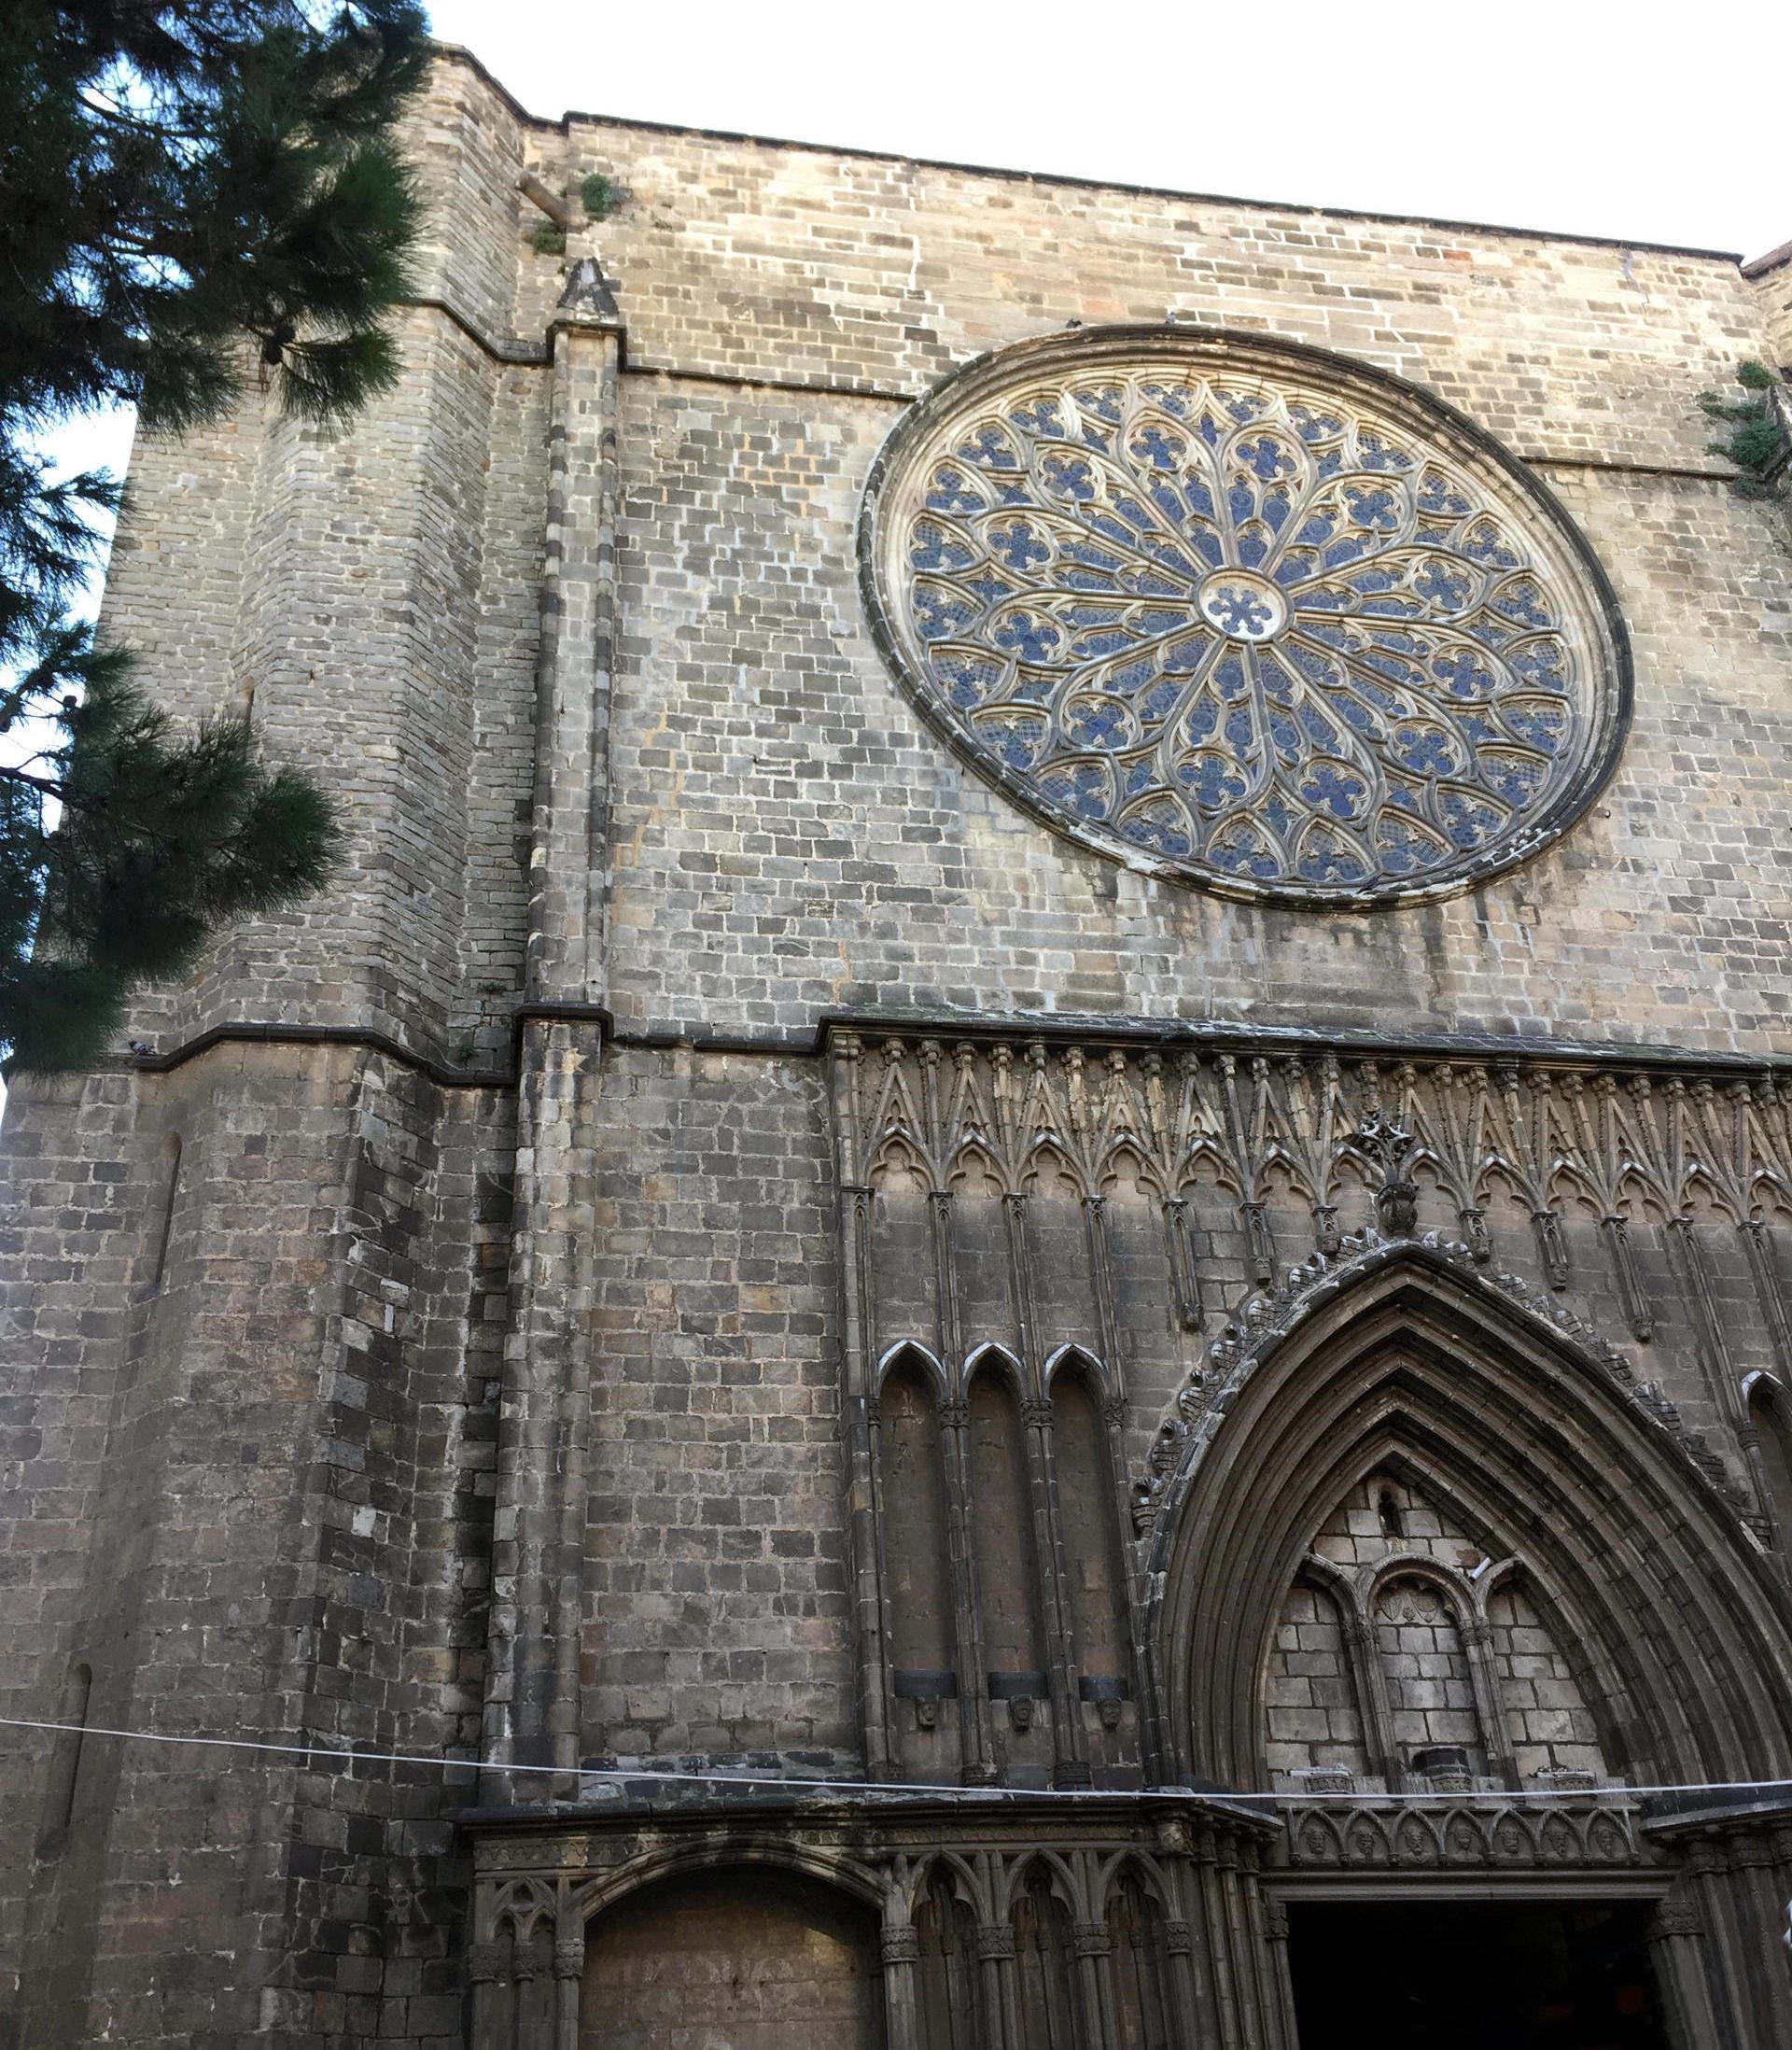 barcelona zabytki gotyk kościół santa maria del pi iglawpodrozy